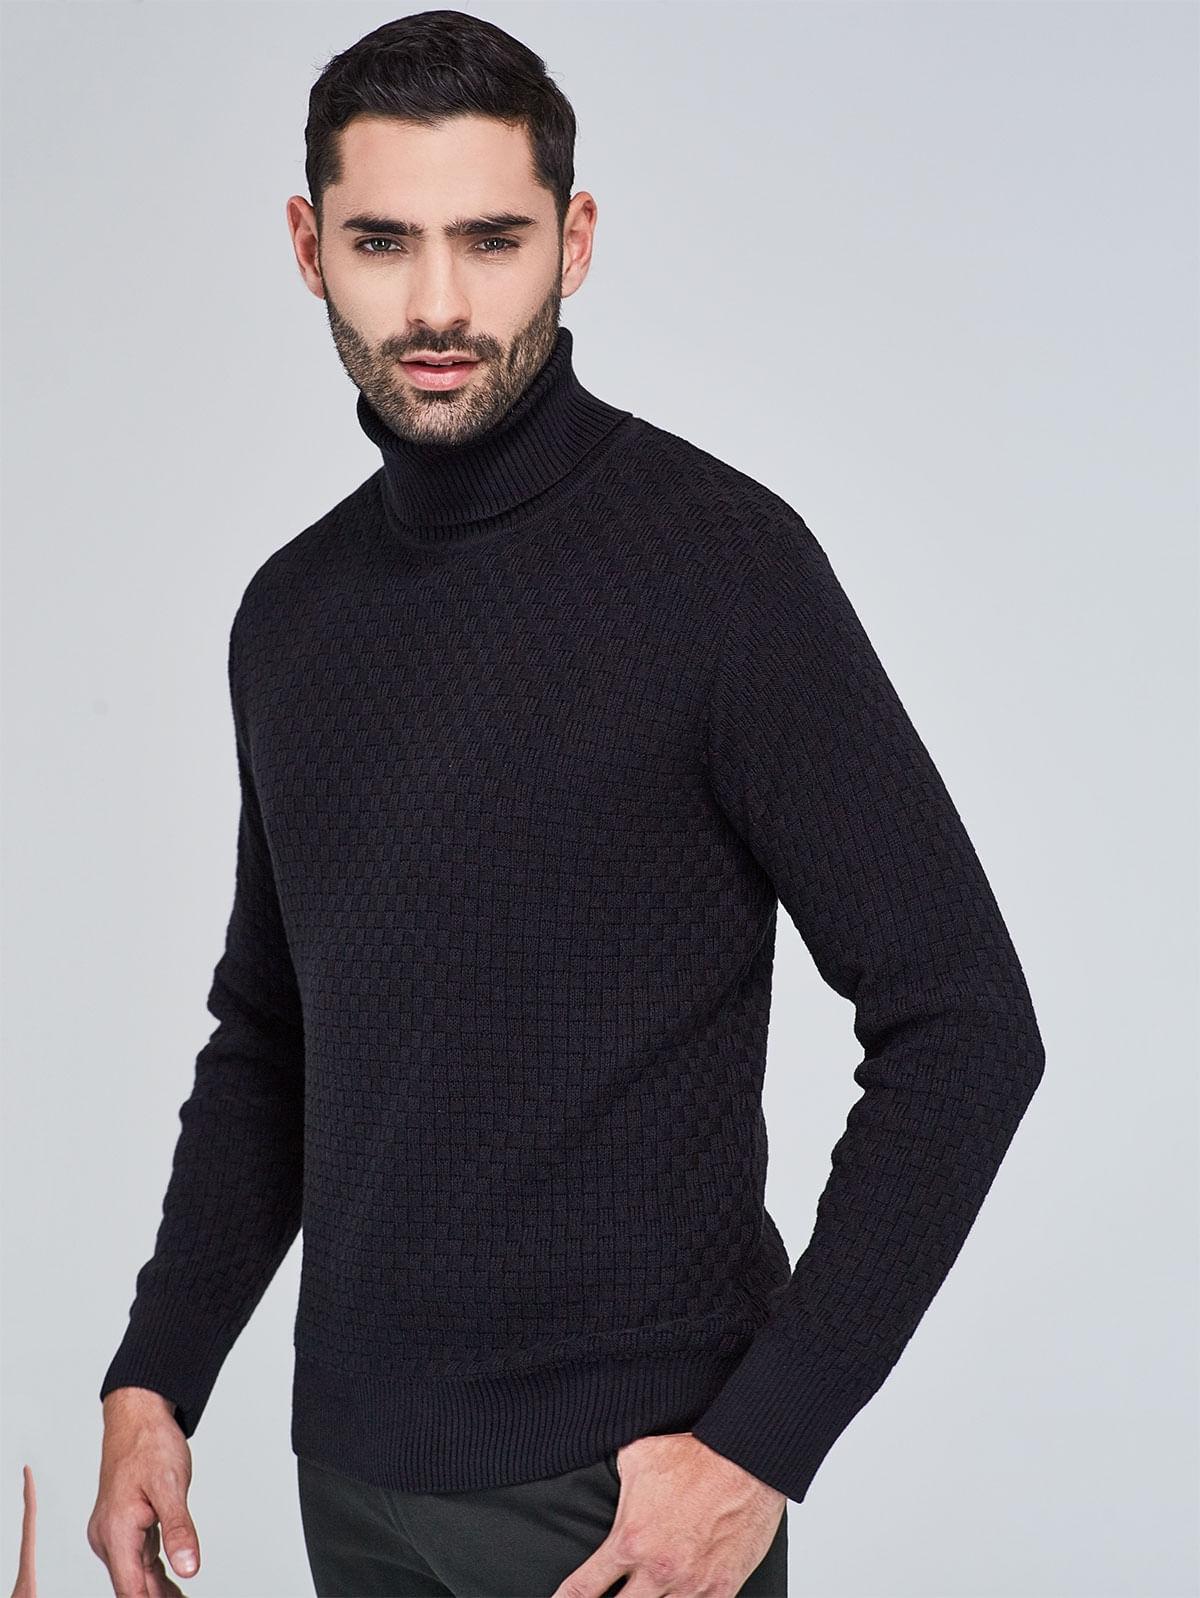 d272ca4625e6c ... Sweater Tejido de Punto Regular Fit con Textura y Cuello Tortuga 85090  ...